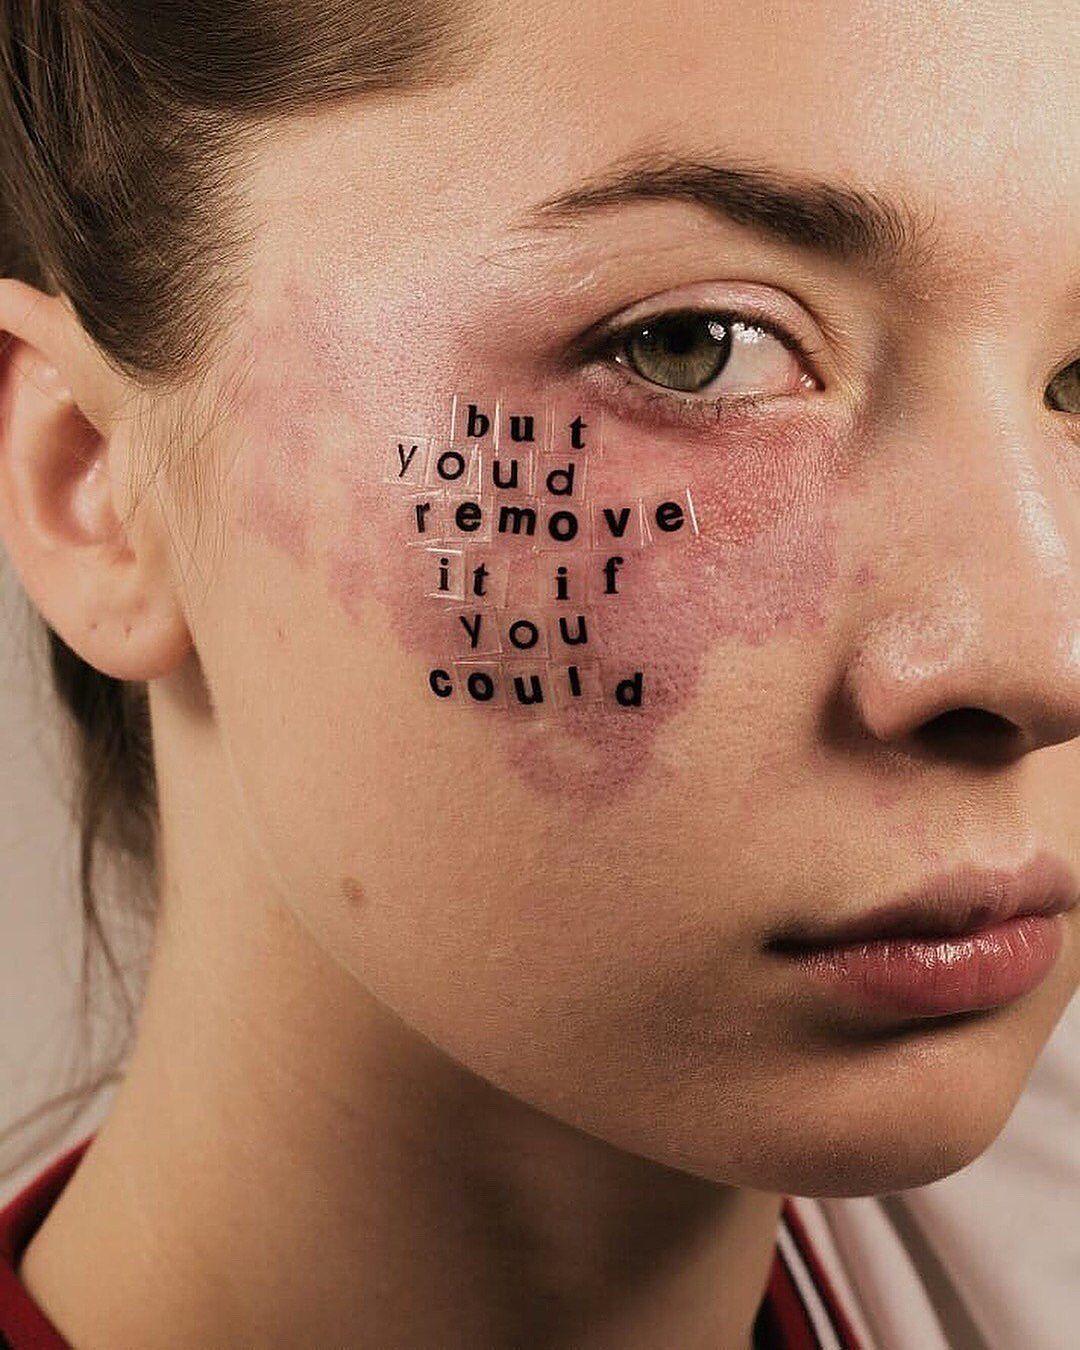 My Birthmark Is Badass Follow Artsvisions By Peterdevito Mode She Is Honestly So Pretty Look At Her Eyes In 2020 Vitiligo Treatment Beauty Standards Vitiligo